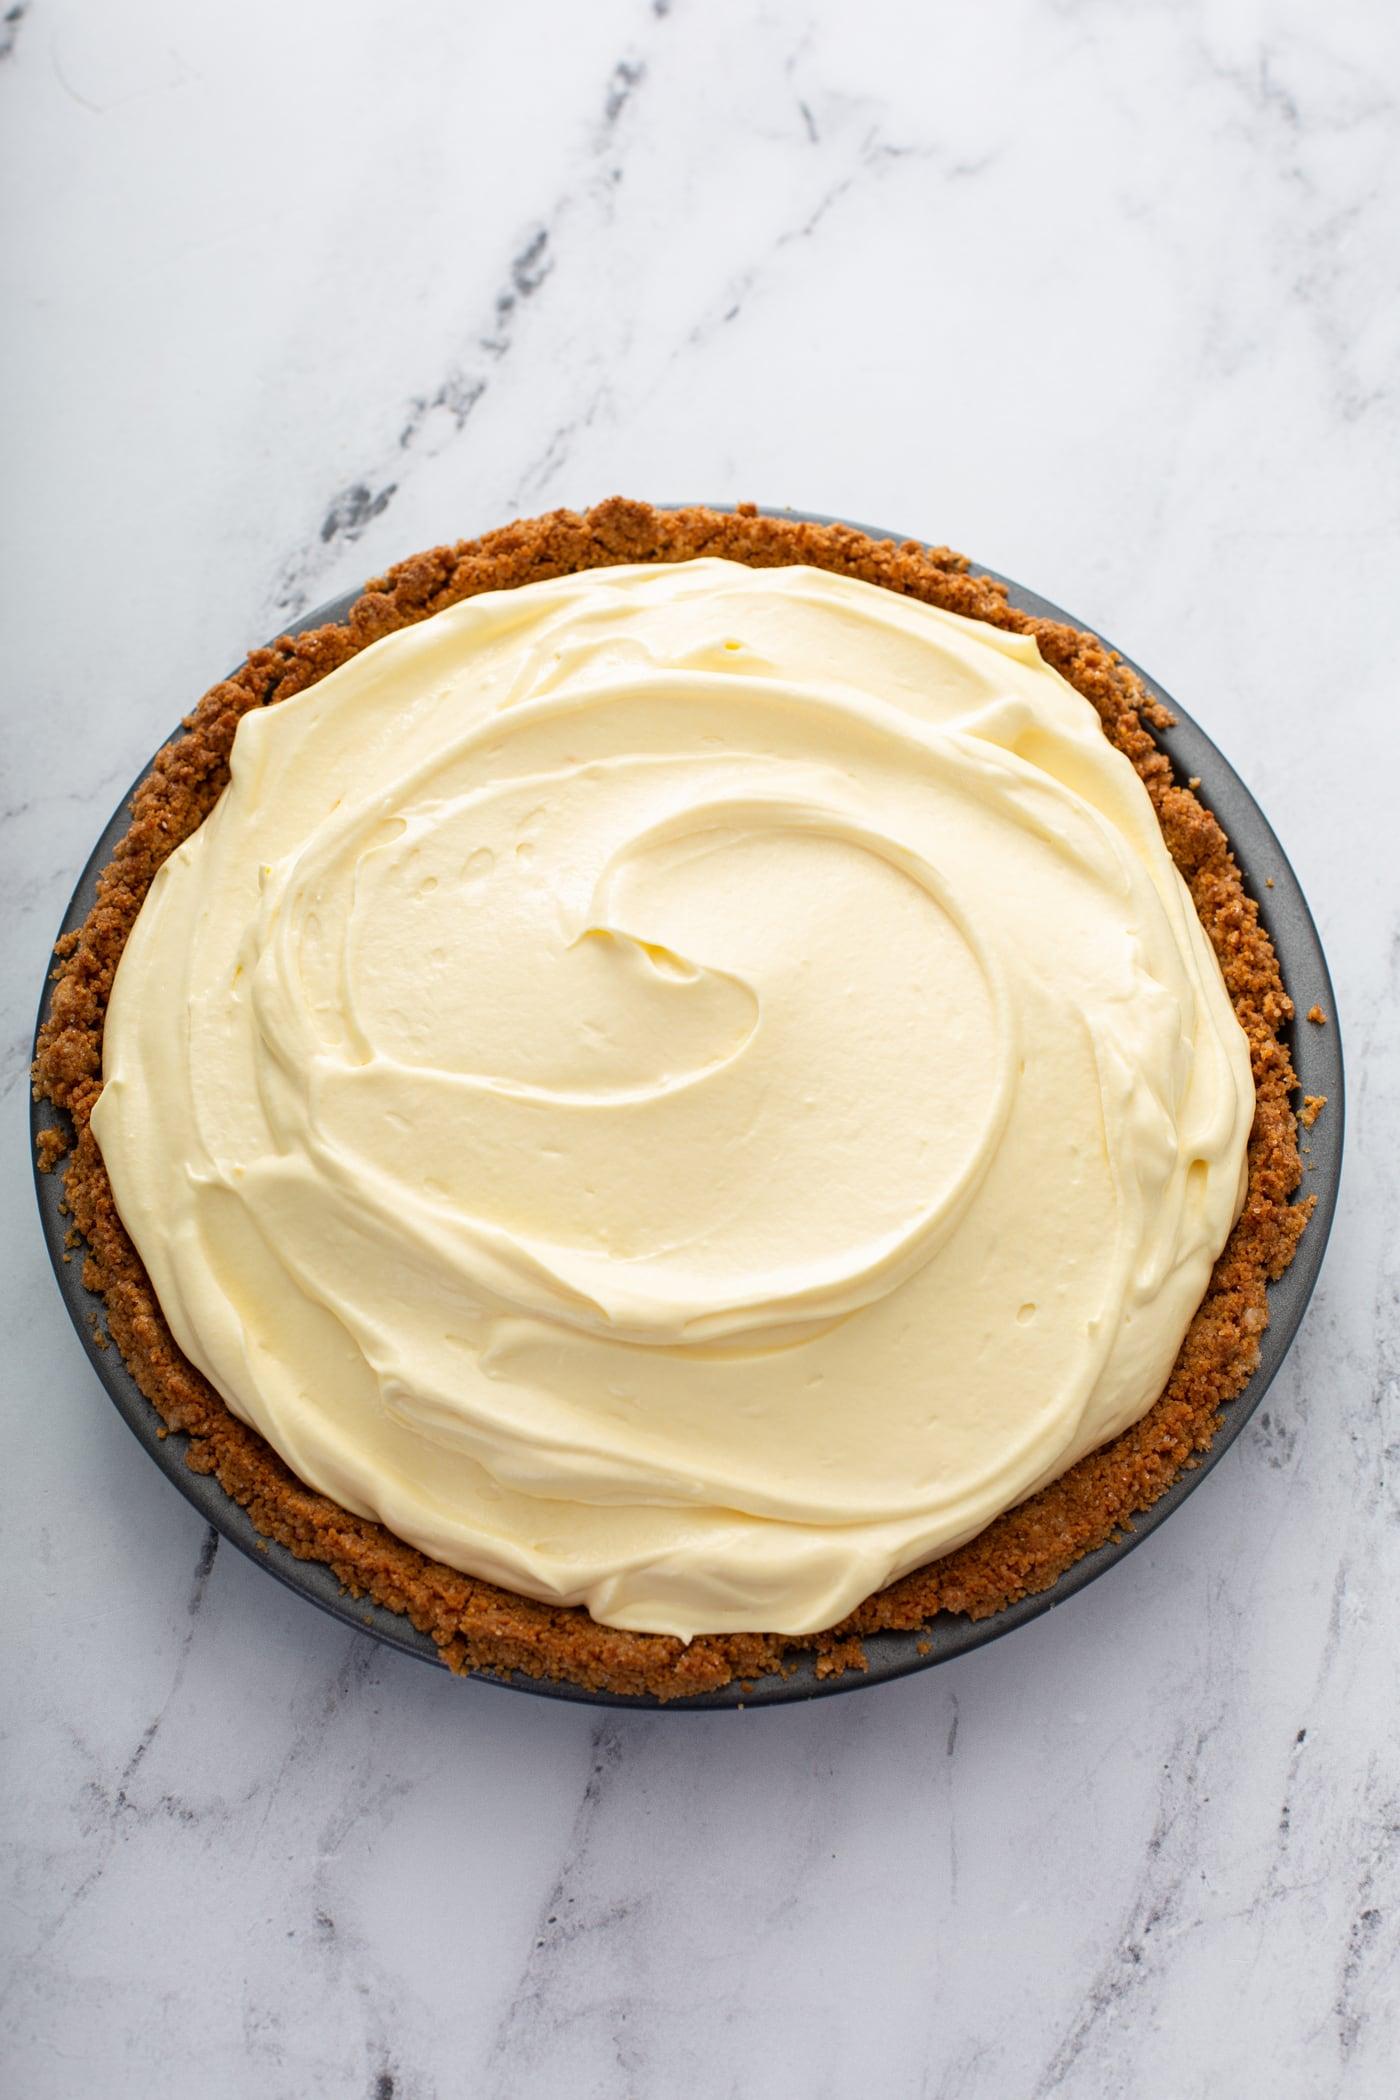 A dulce de leche banana cream pie in a graham cracker crust.  The filling is light yellow and the crust is a deep graham cracker brown.